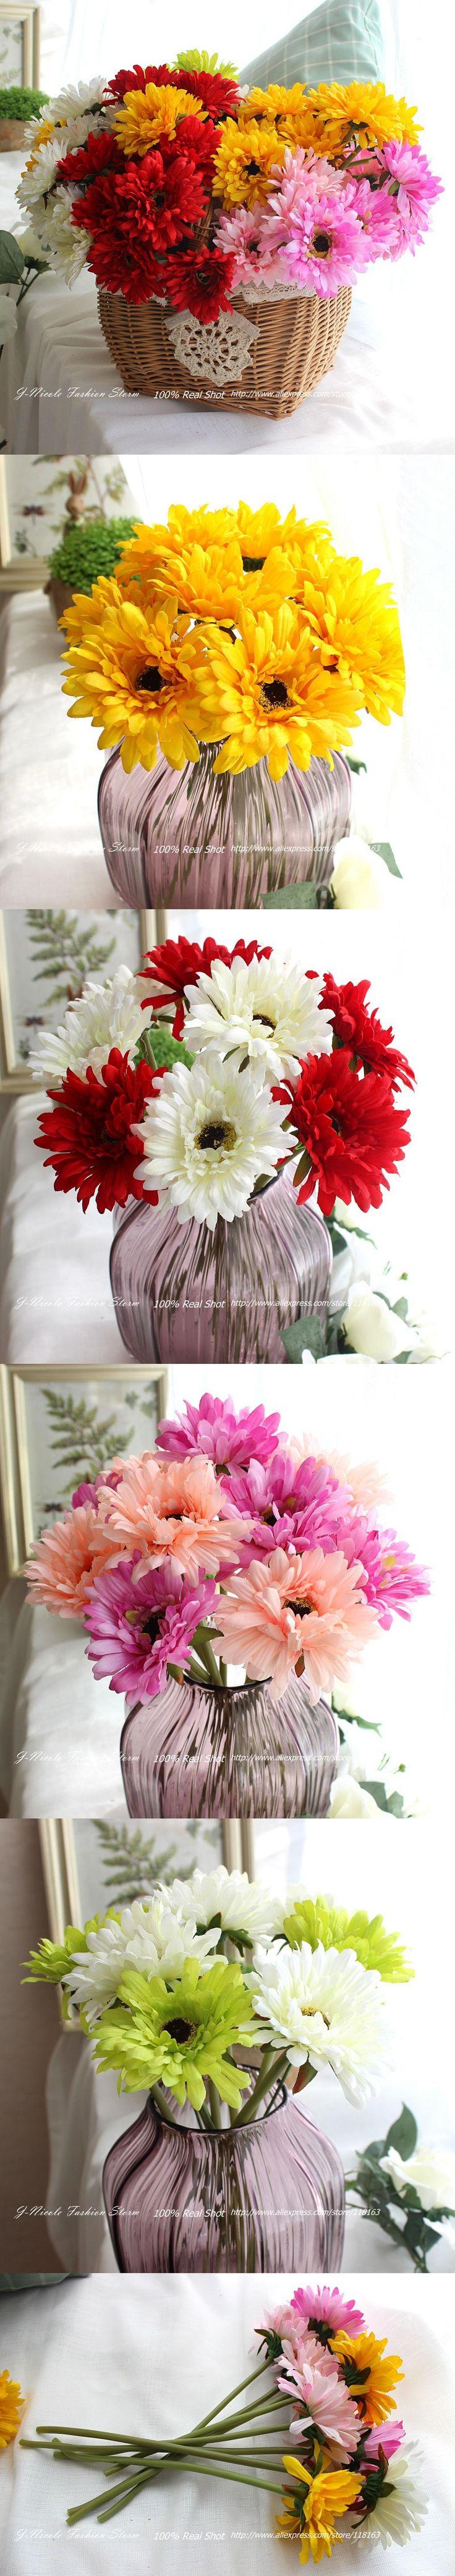 9pcs/lot Spring 1 Head Fresh Gerbera Decorative Silk Crown Daisy Aritificial Flowers Home Decor Wedding Bridal Bouquet $11.29